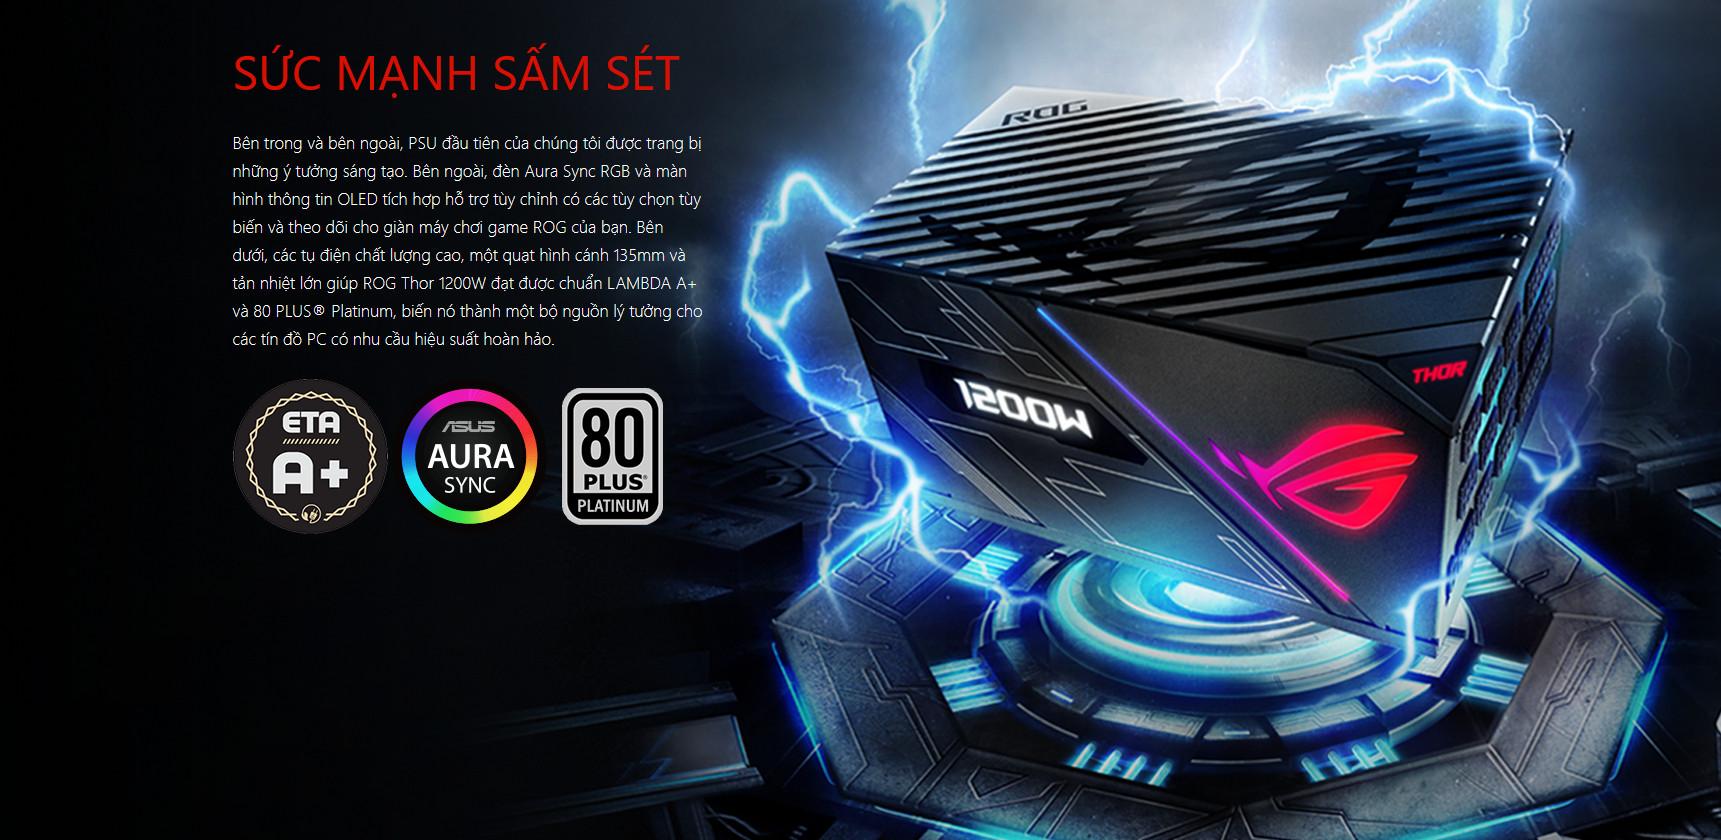 Nguồn Asus ROG Thor 1200W Platinum - RGB 1200W 80 Plus Platinum Full Modular giới thiệu